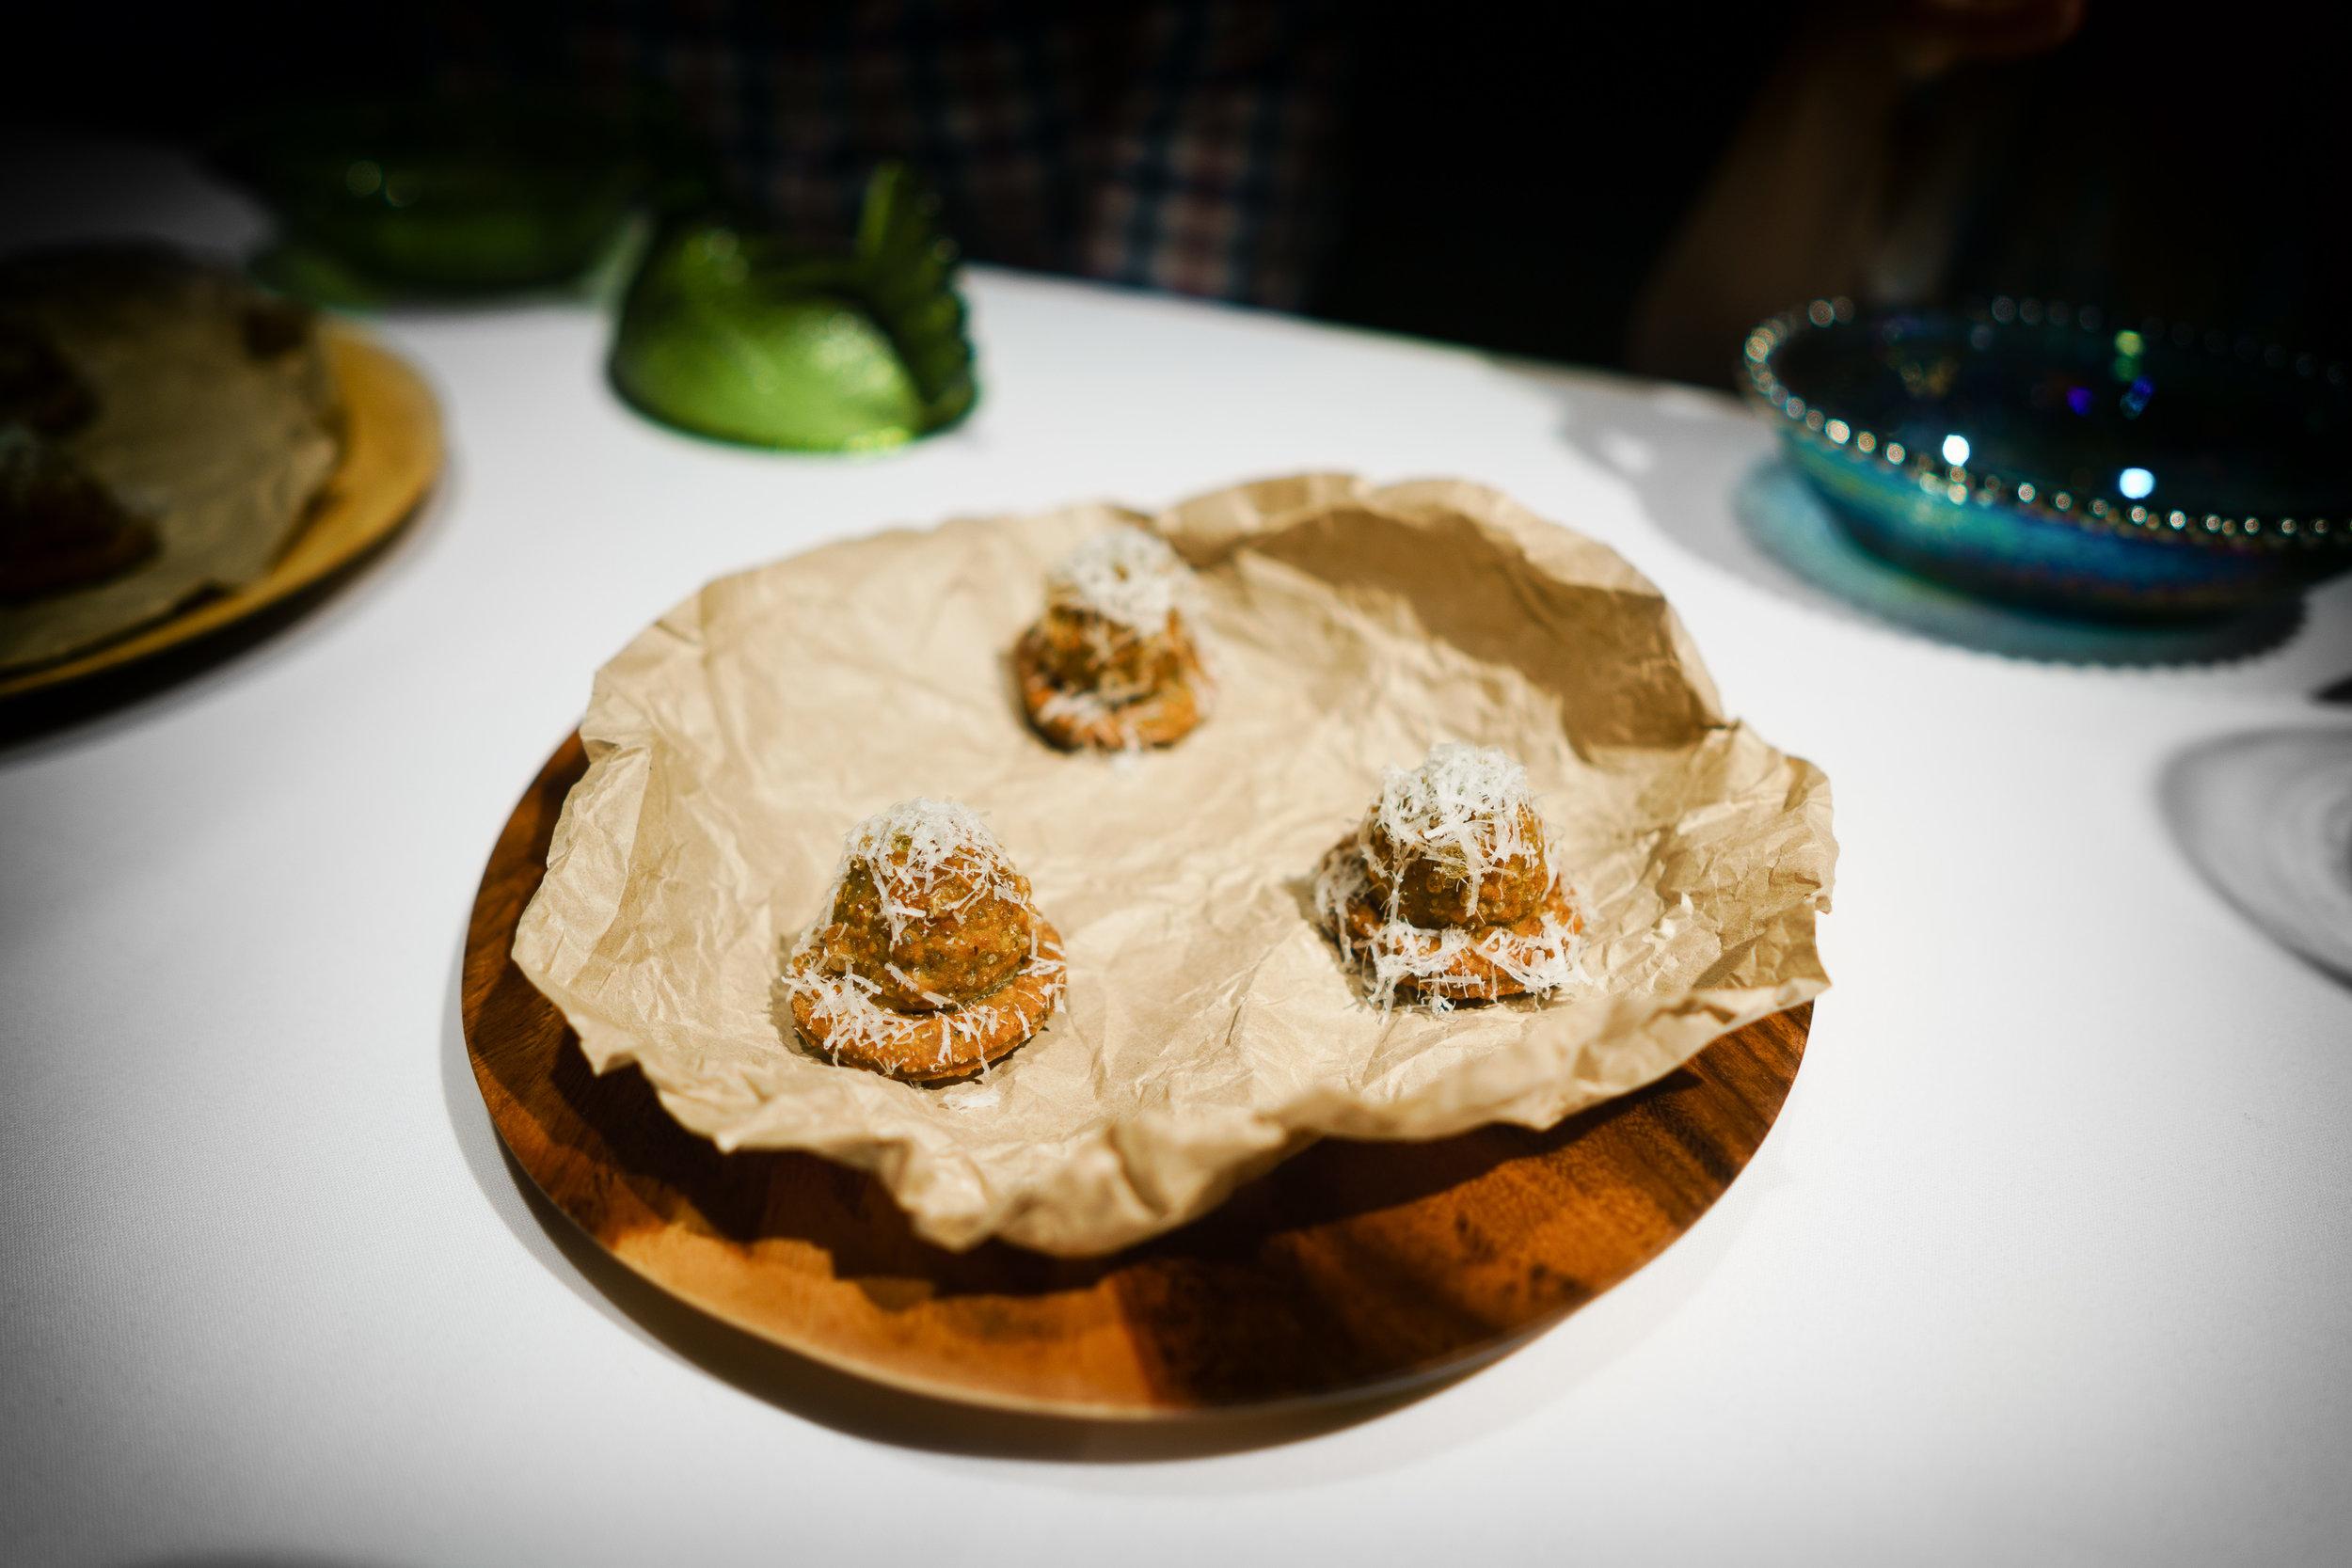 9th Course: Gazza's Vegemite Pie